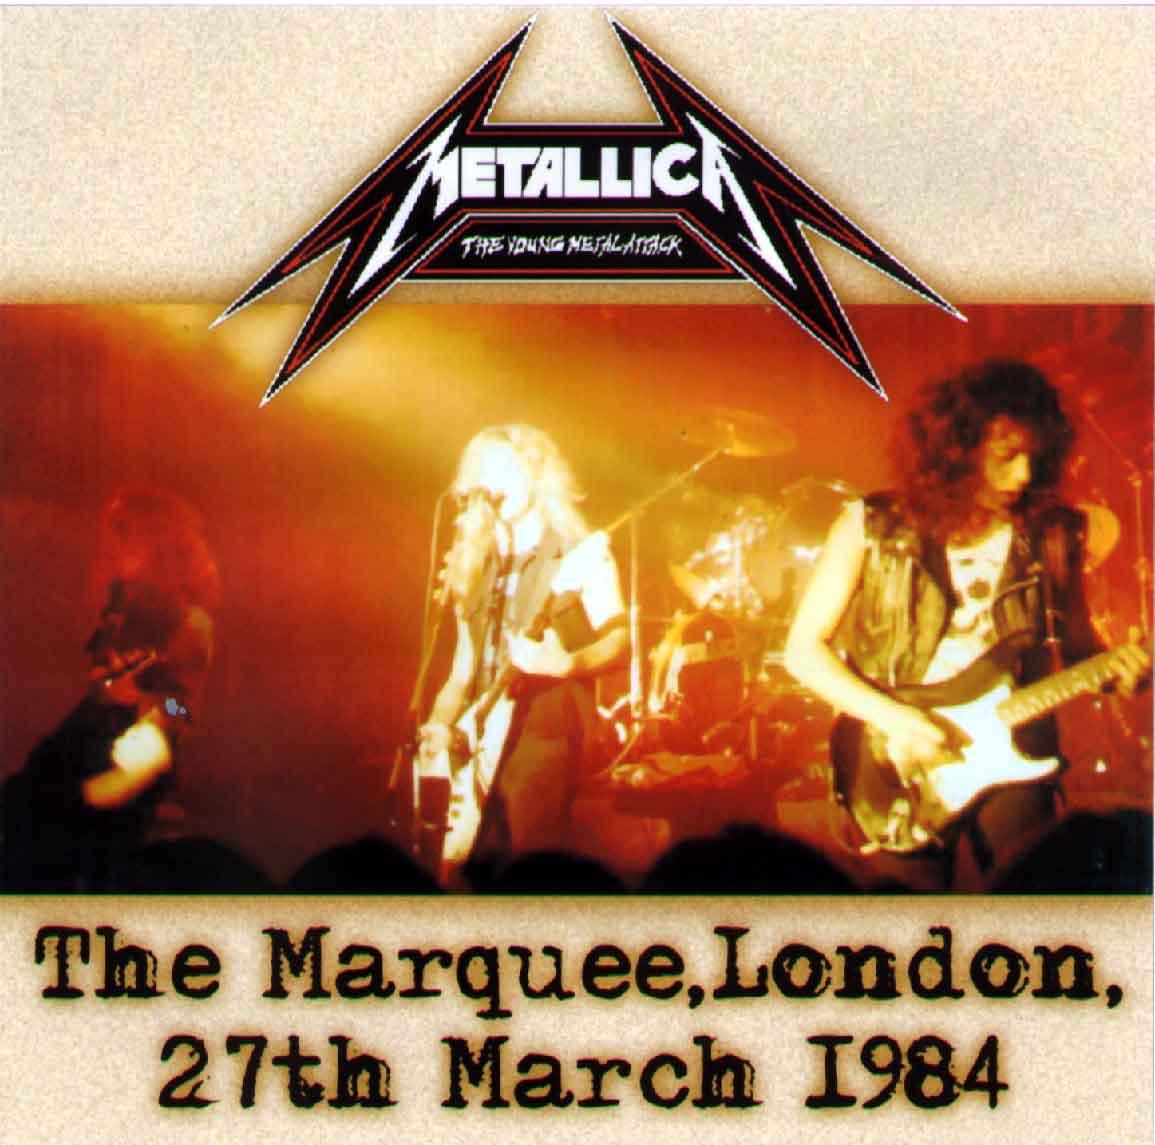 METALLICA – 1984-03-27 LONDON UK (Source 1) | Old Metal Bootlegs